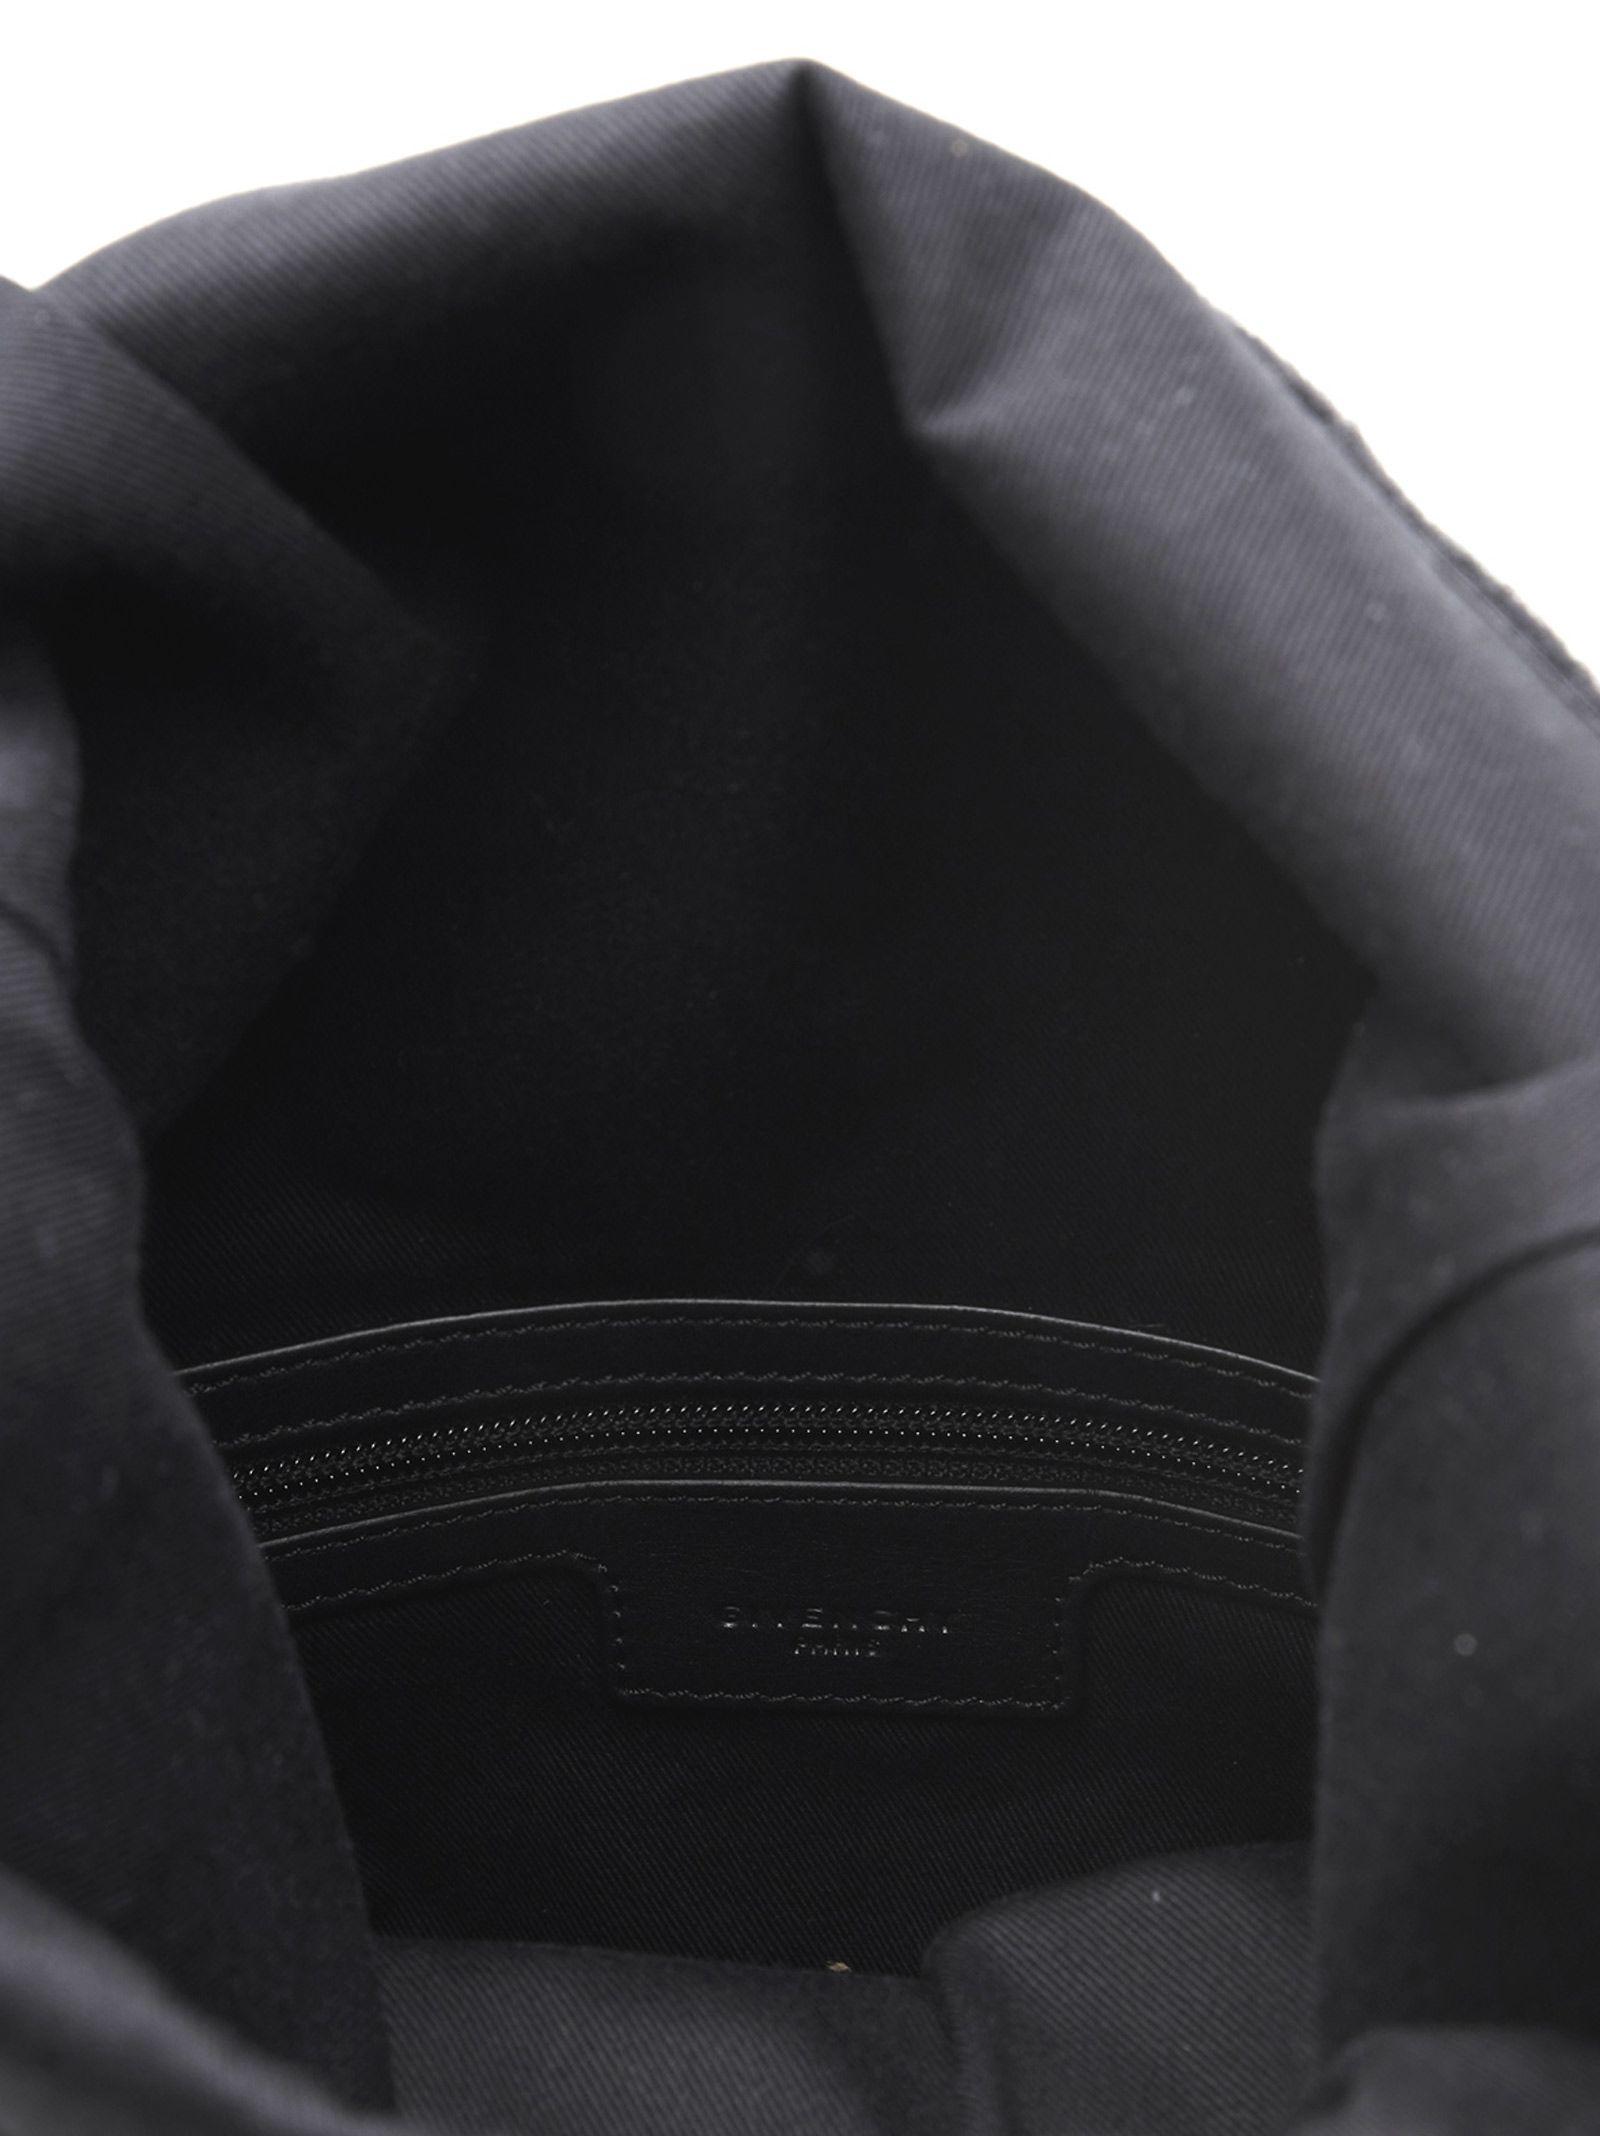 30b41ca09a10 Givenchy Givenchy  jaw  Bag - Black - 10796870